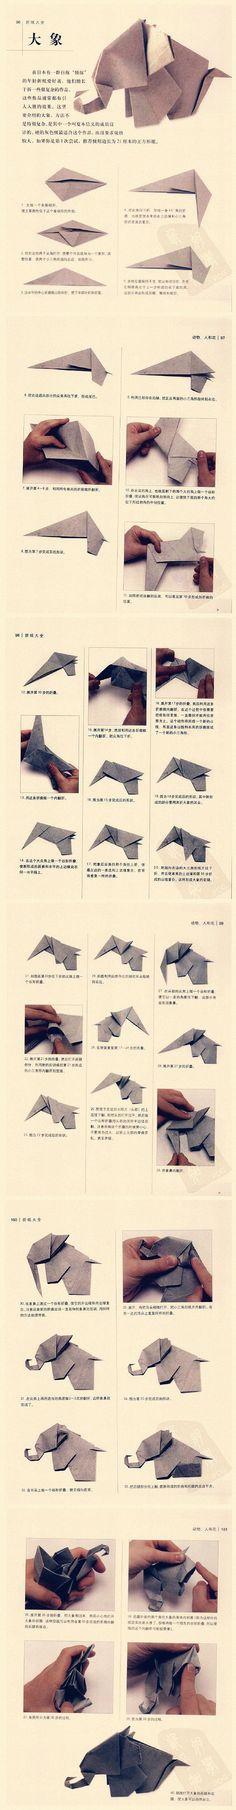 origami elephant-love this elephant, wish instructions were translated into English. – Origami World Origami Tutorial, Origami Diy, Origami And Kirigami, Paper Crafts Origami, Oragami, Origami Instructions, Diy Paper, Origami Boxes, Dollar Origami